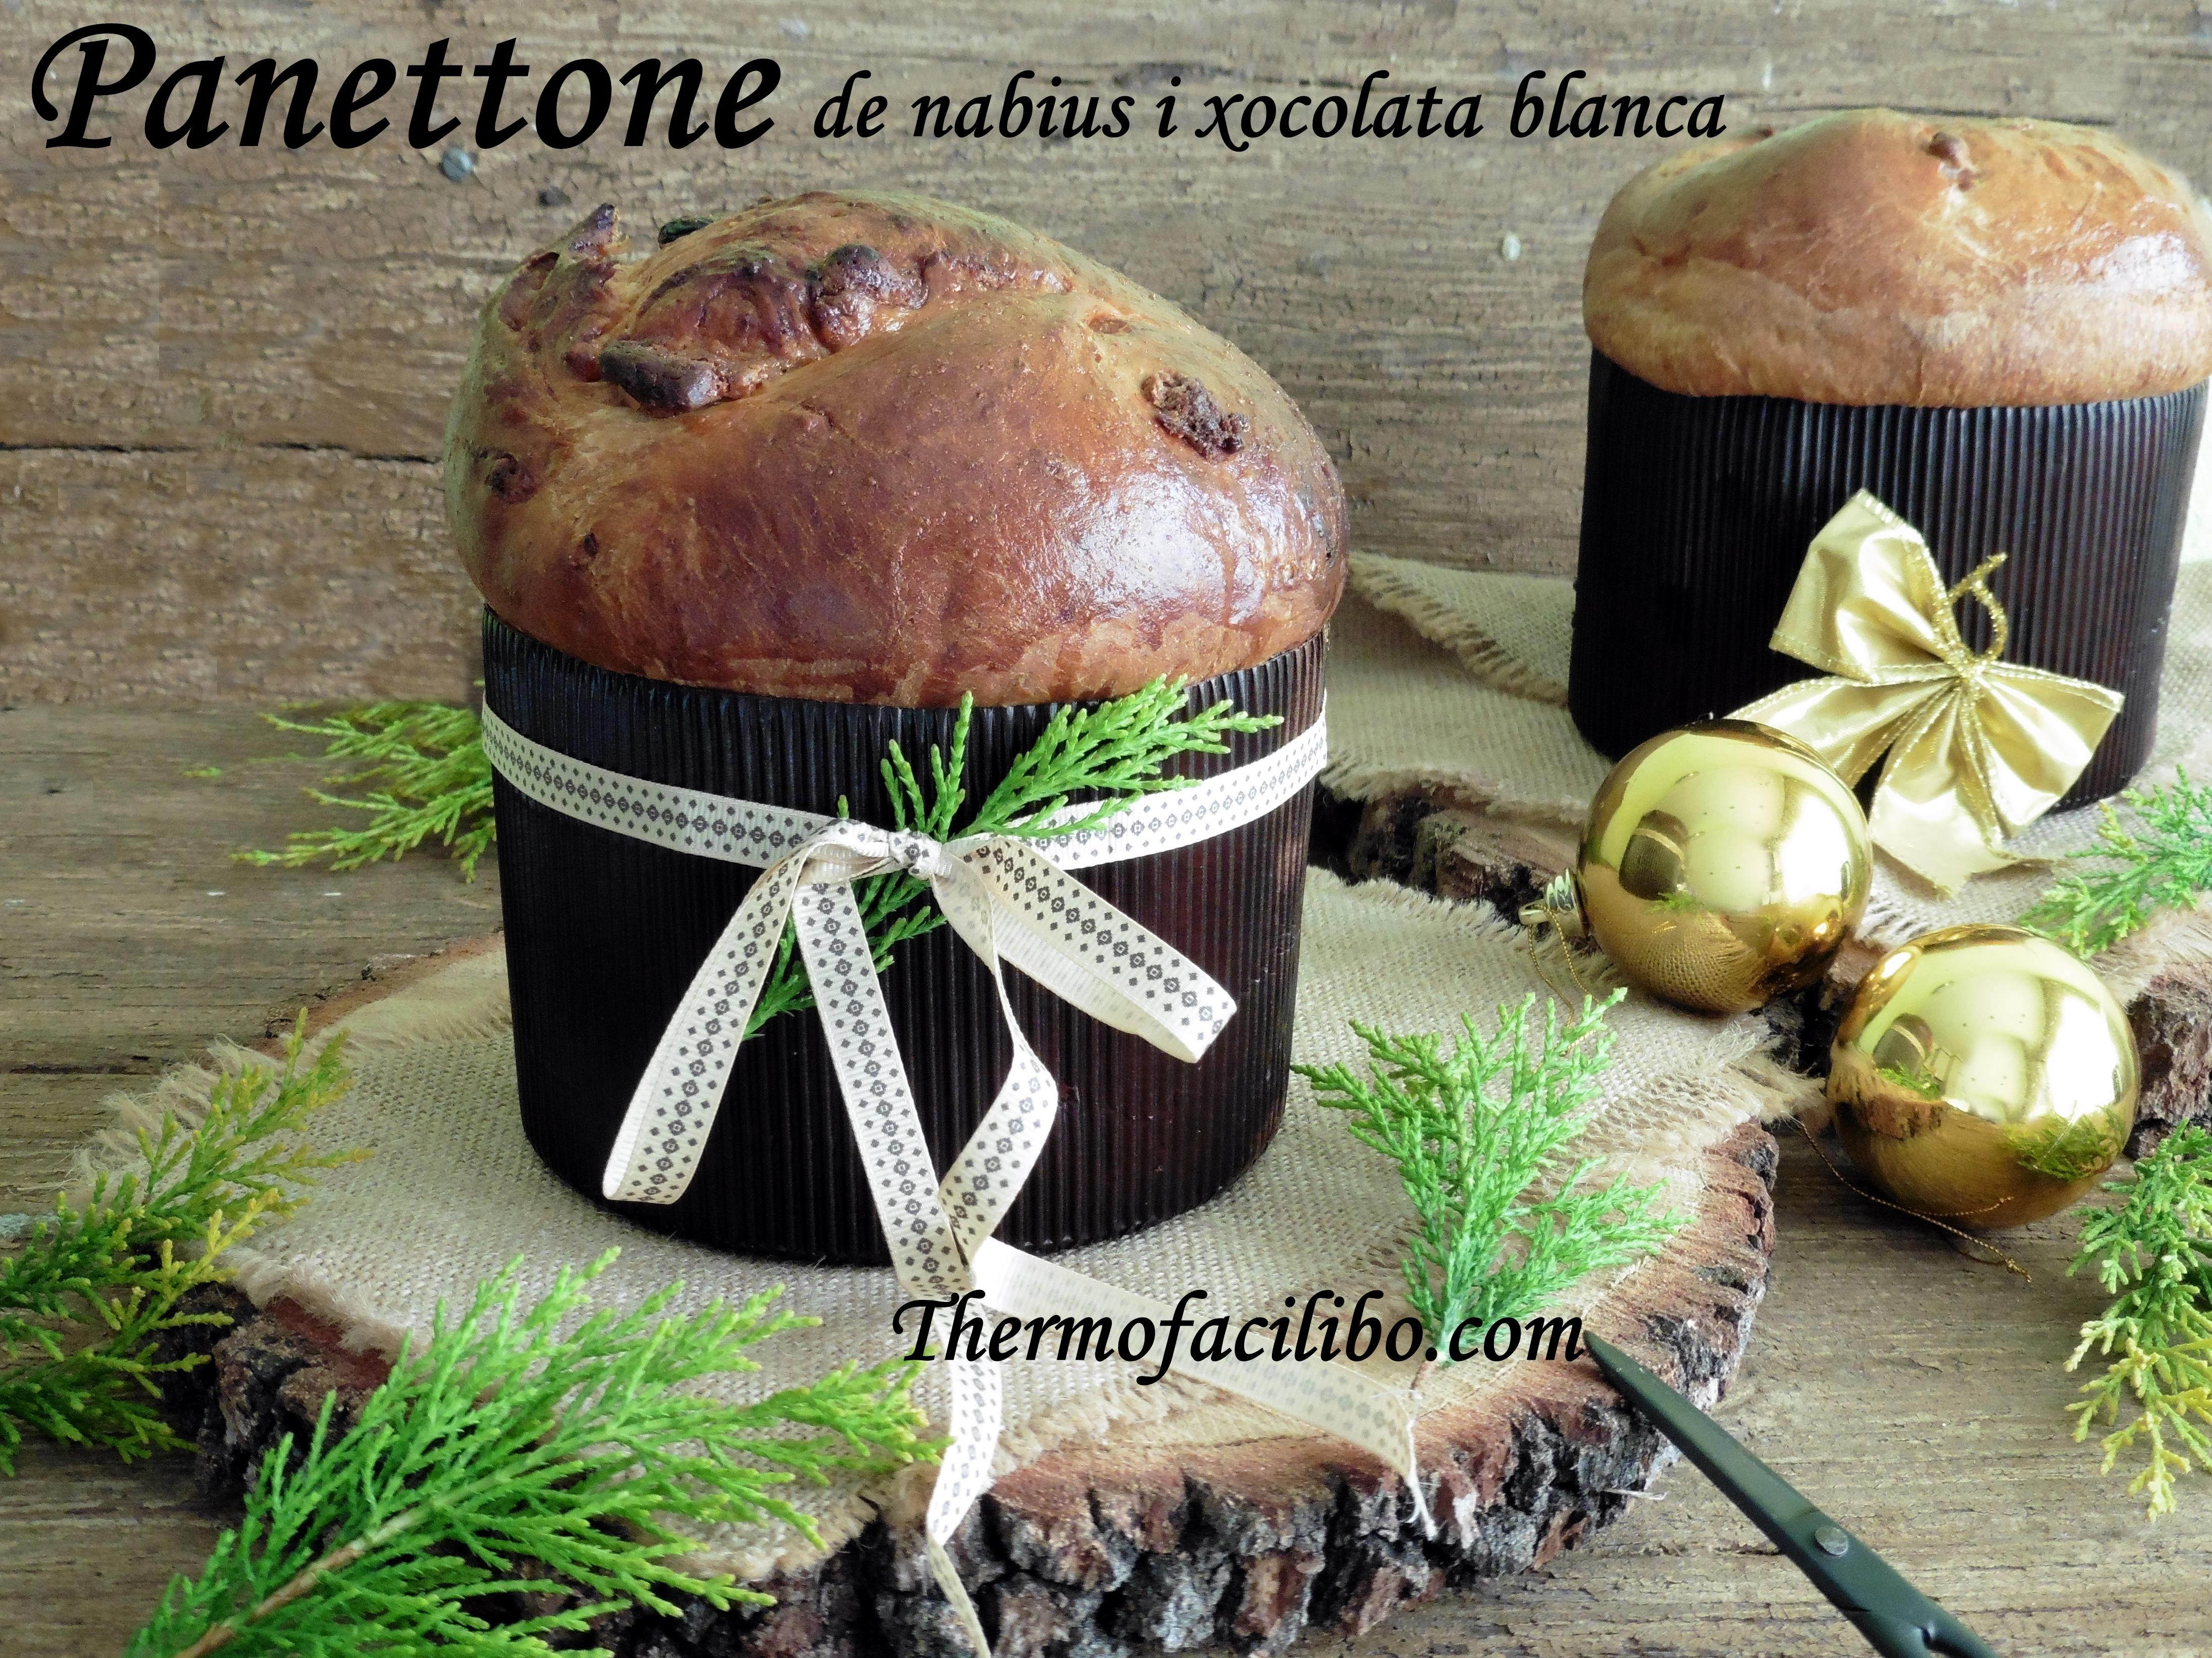 Panettone de nabius i xocolata blanca